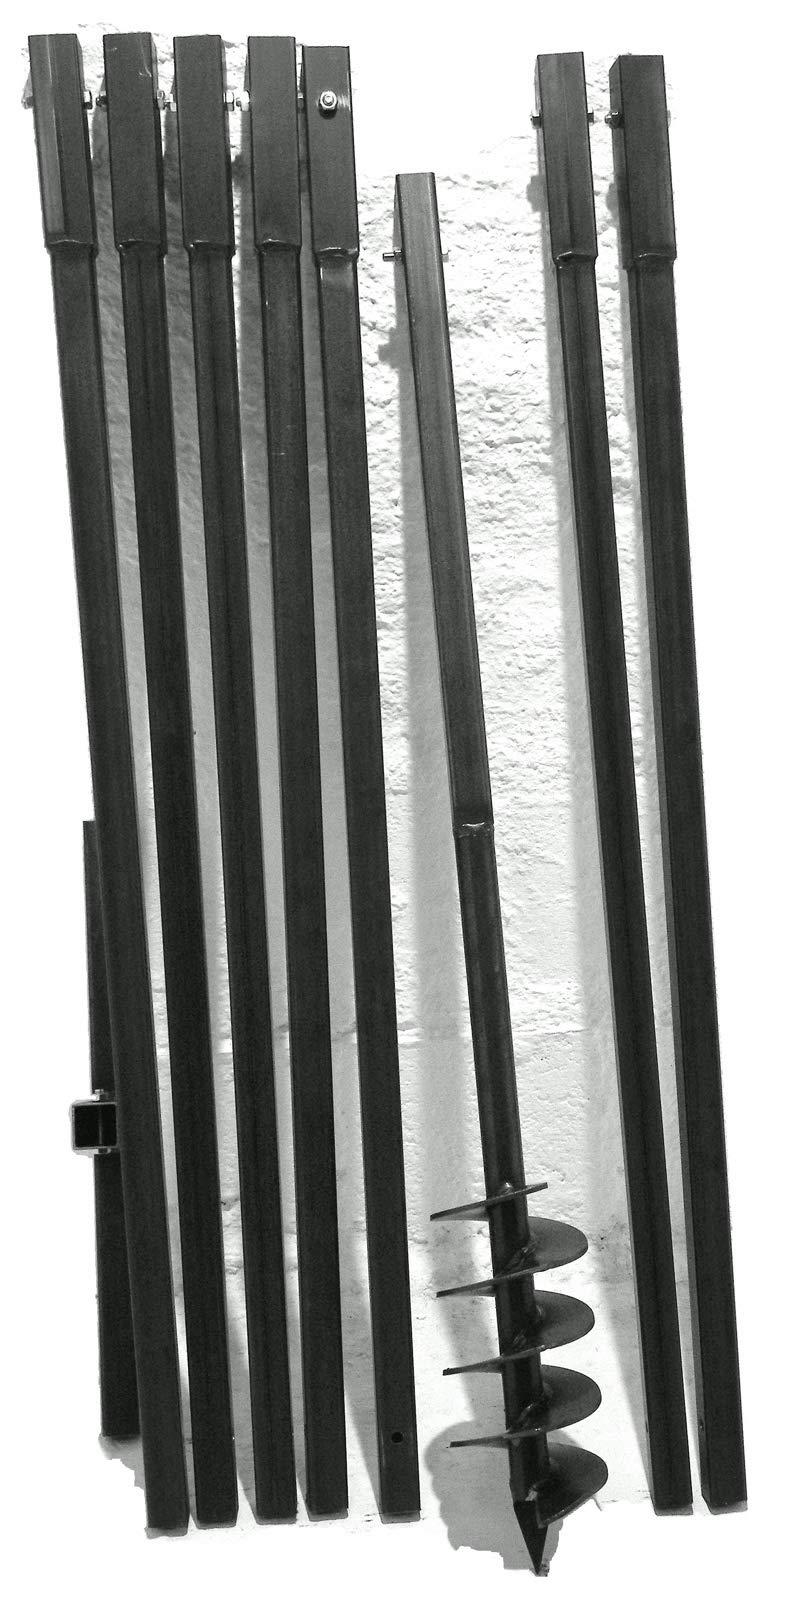 160mm Bohrkopf 1,1m Erdbohrer m Lochspaten Pfahlbohrer Motorbohrer Bohrer --